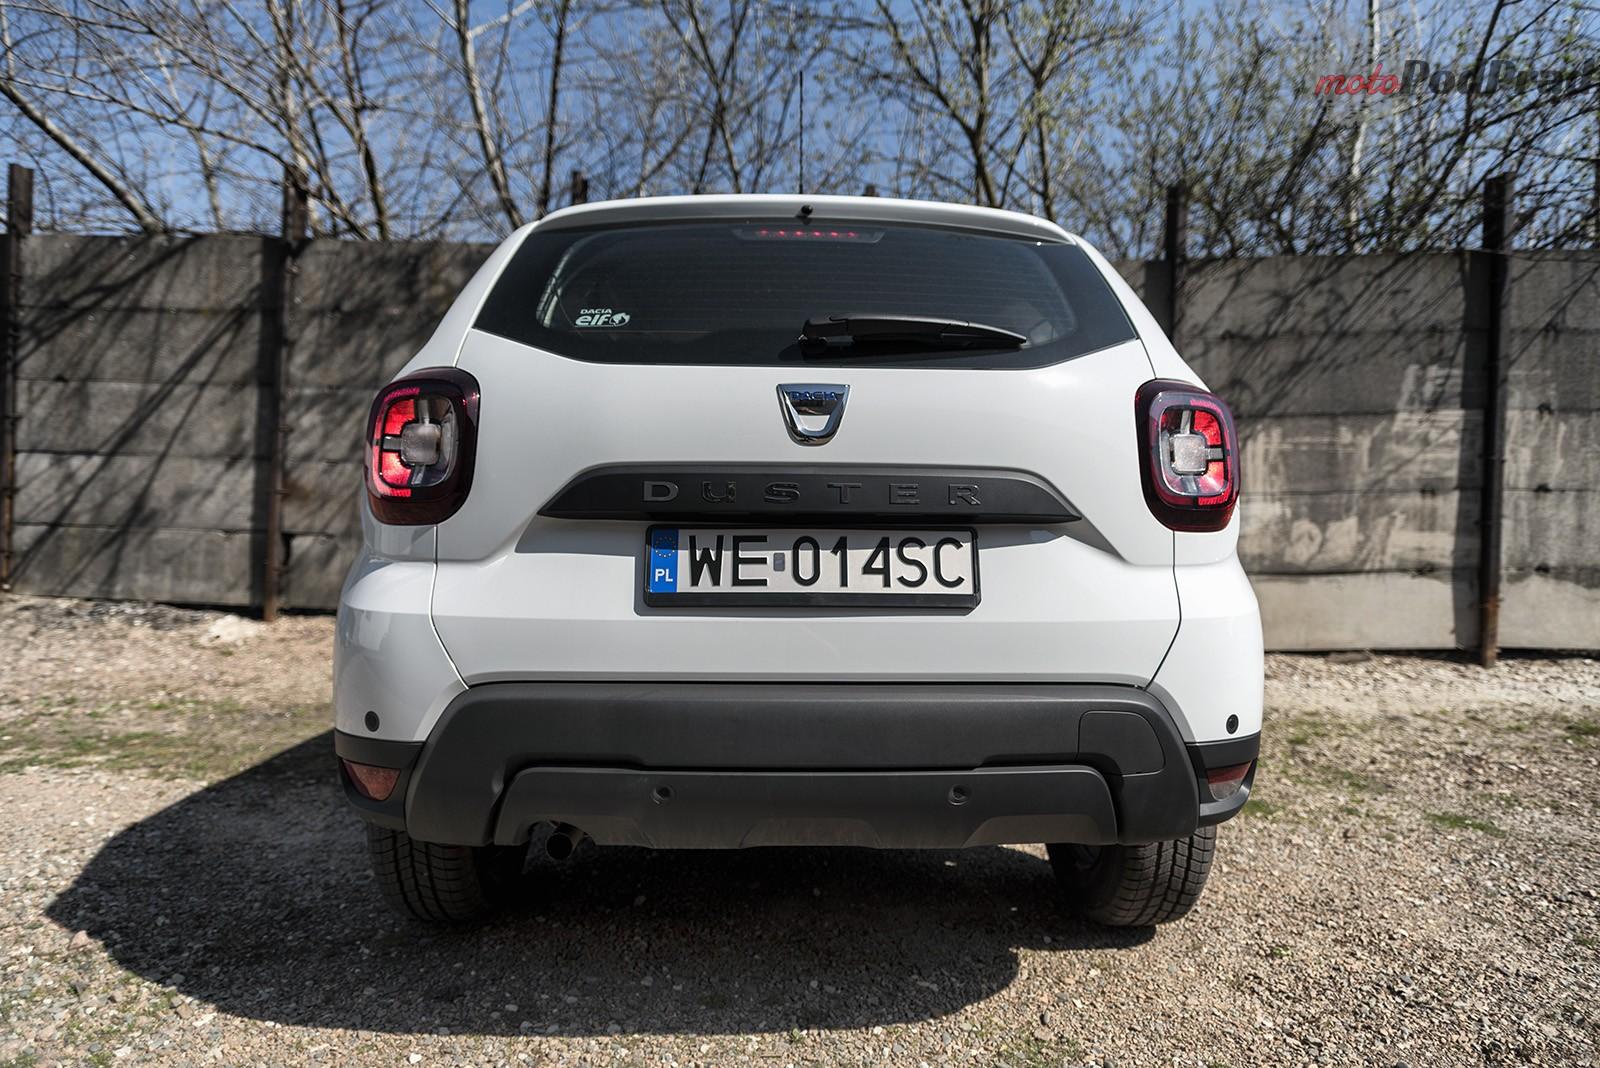 Dacia Duster 10 Test: Dacia Duster 1.5dci 90 KM   wiesz za co płacisz